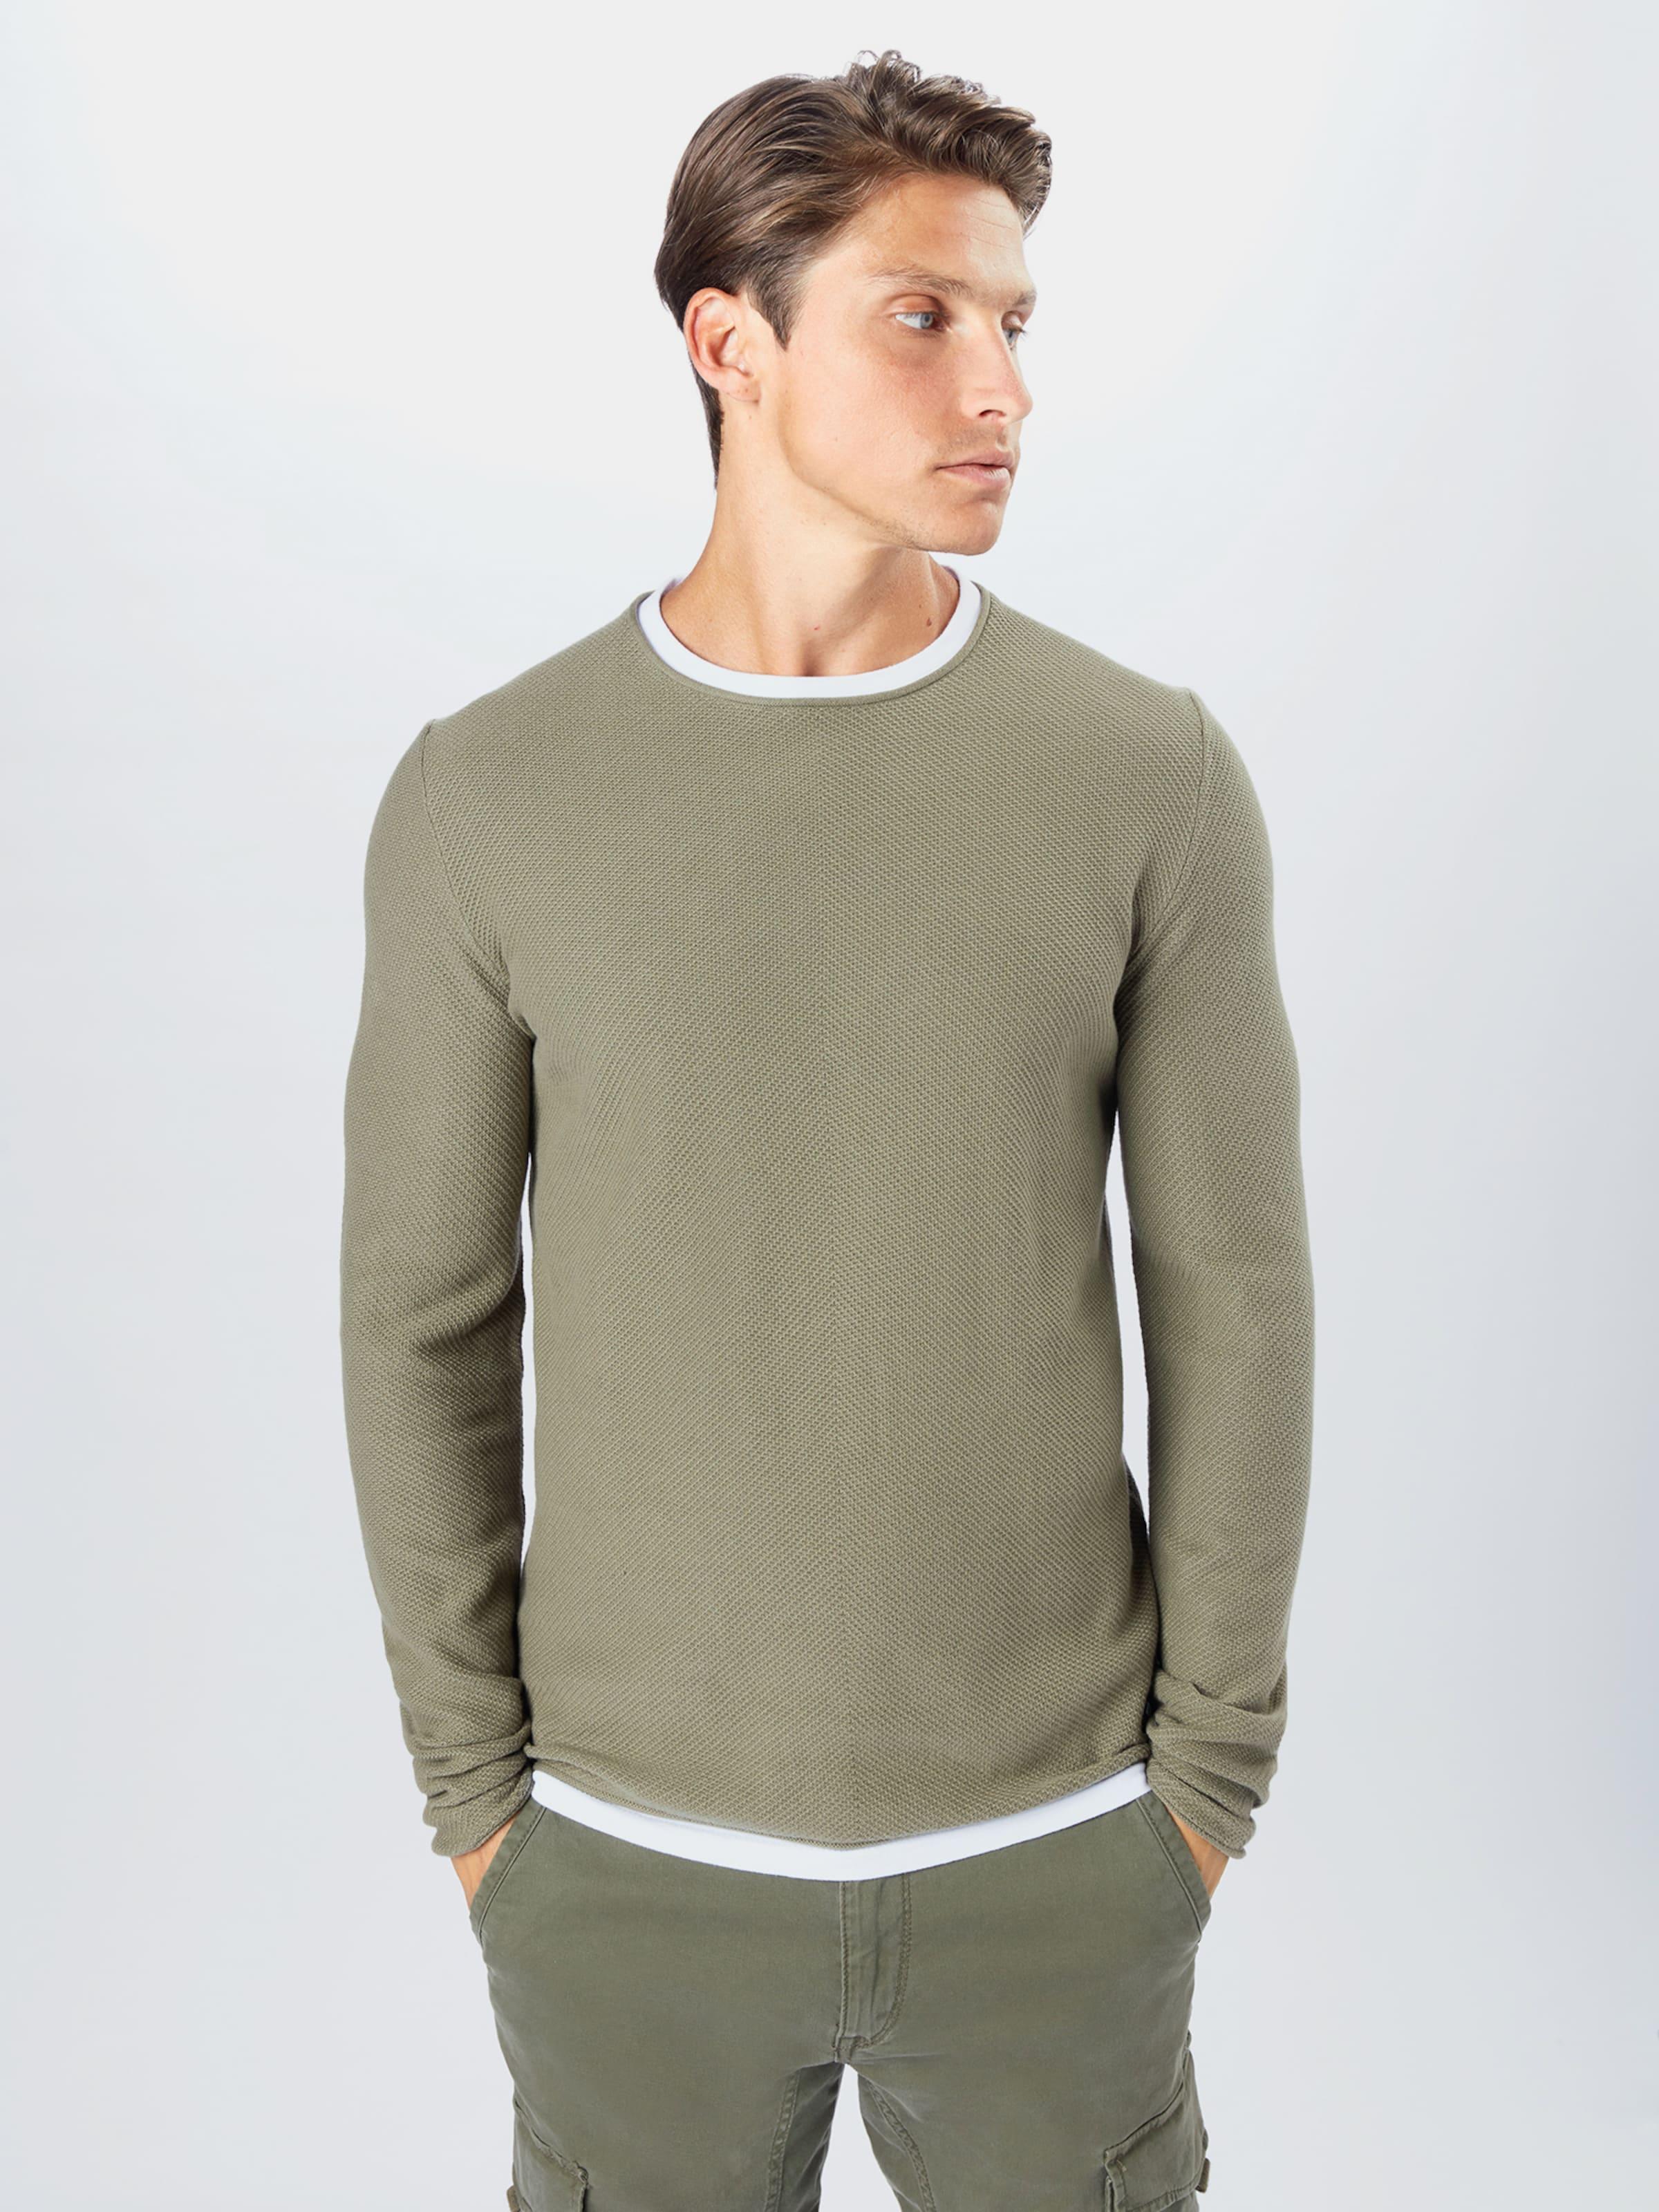 TOM TAILOR DENIM Pullover in oliv / offwhite Unifarben TTD3850003000006